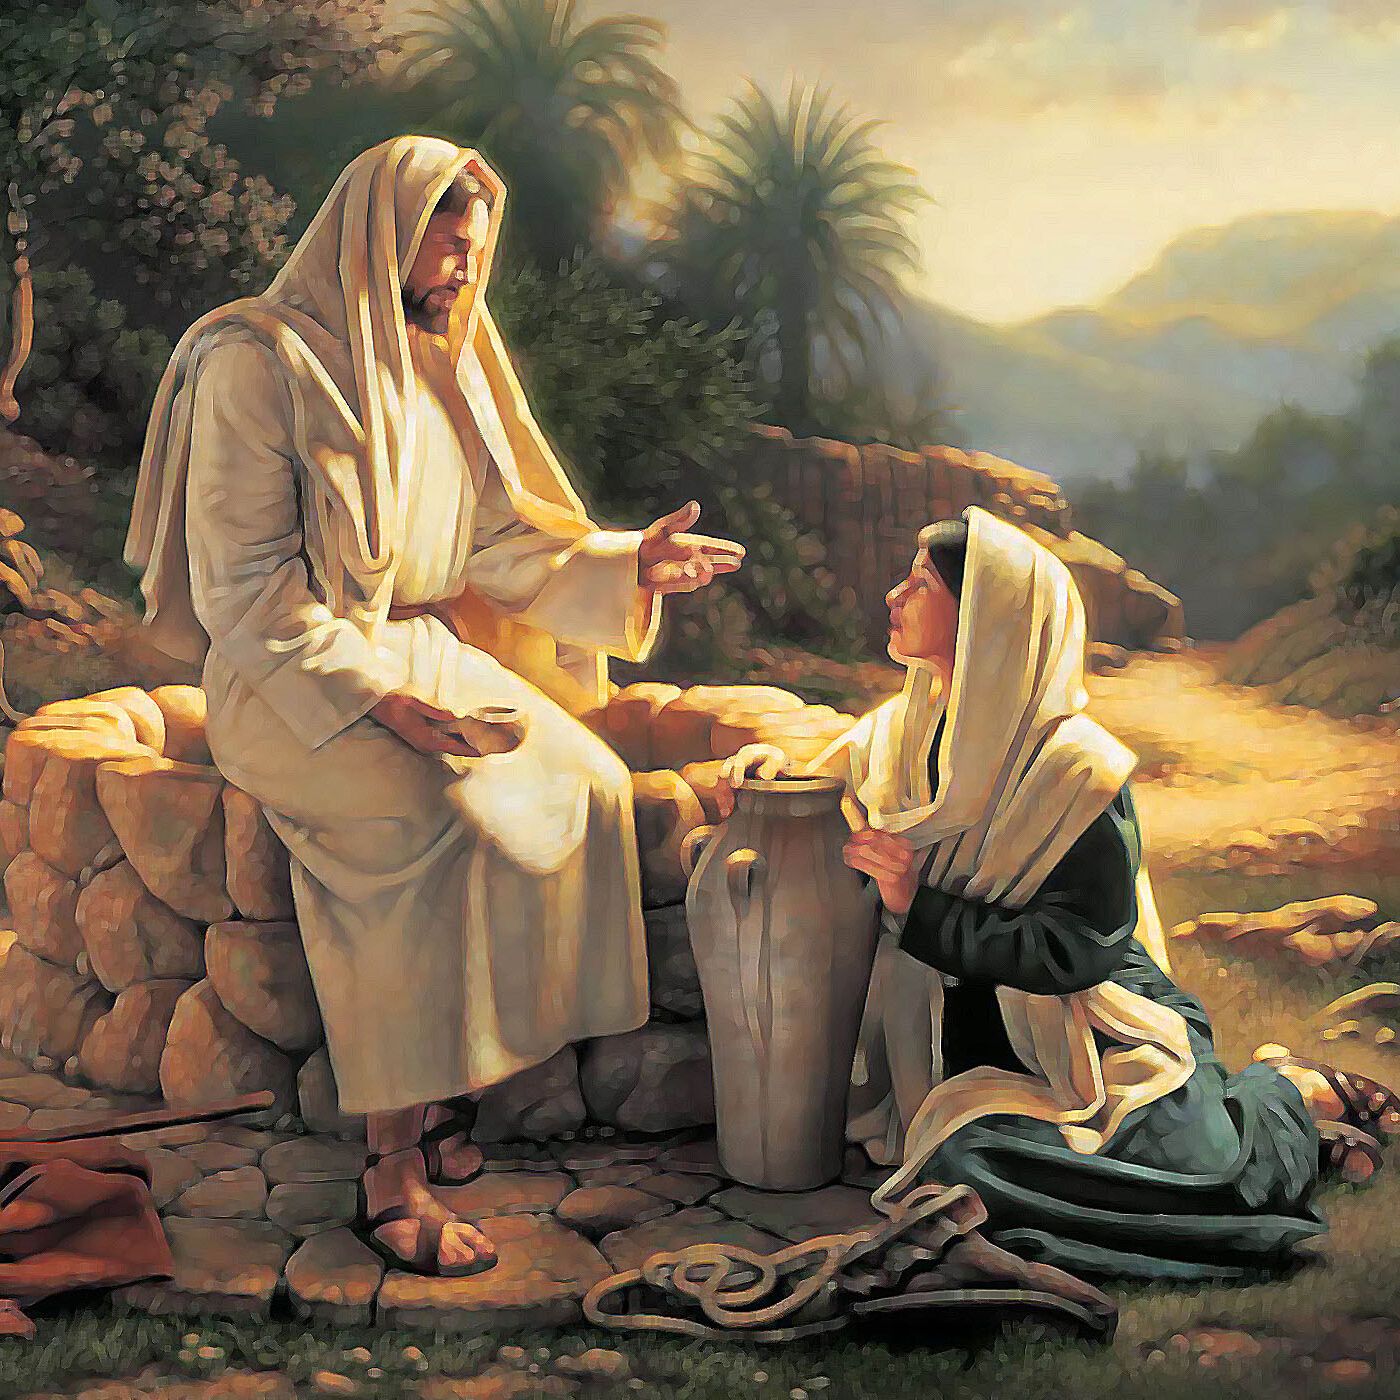 riflessioni sul Vangelo di Mercoledì 28 Aprile 2021 (Gv 12, 44-50)